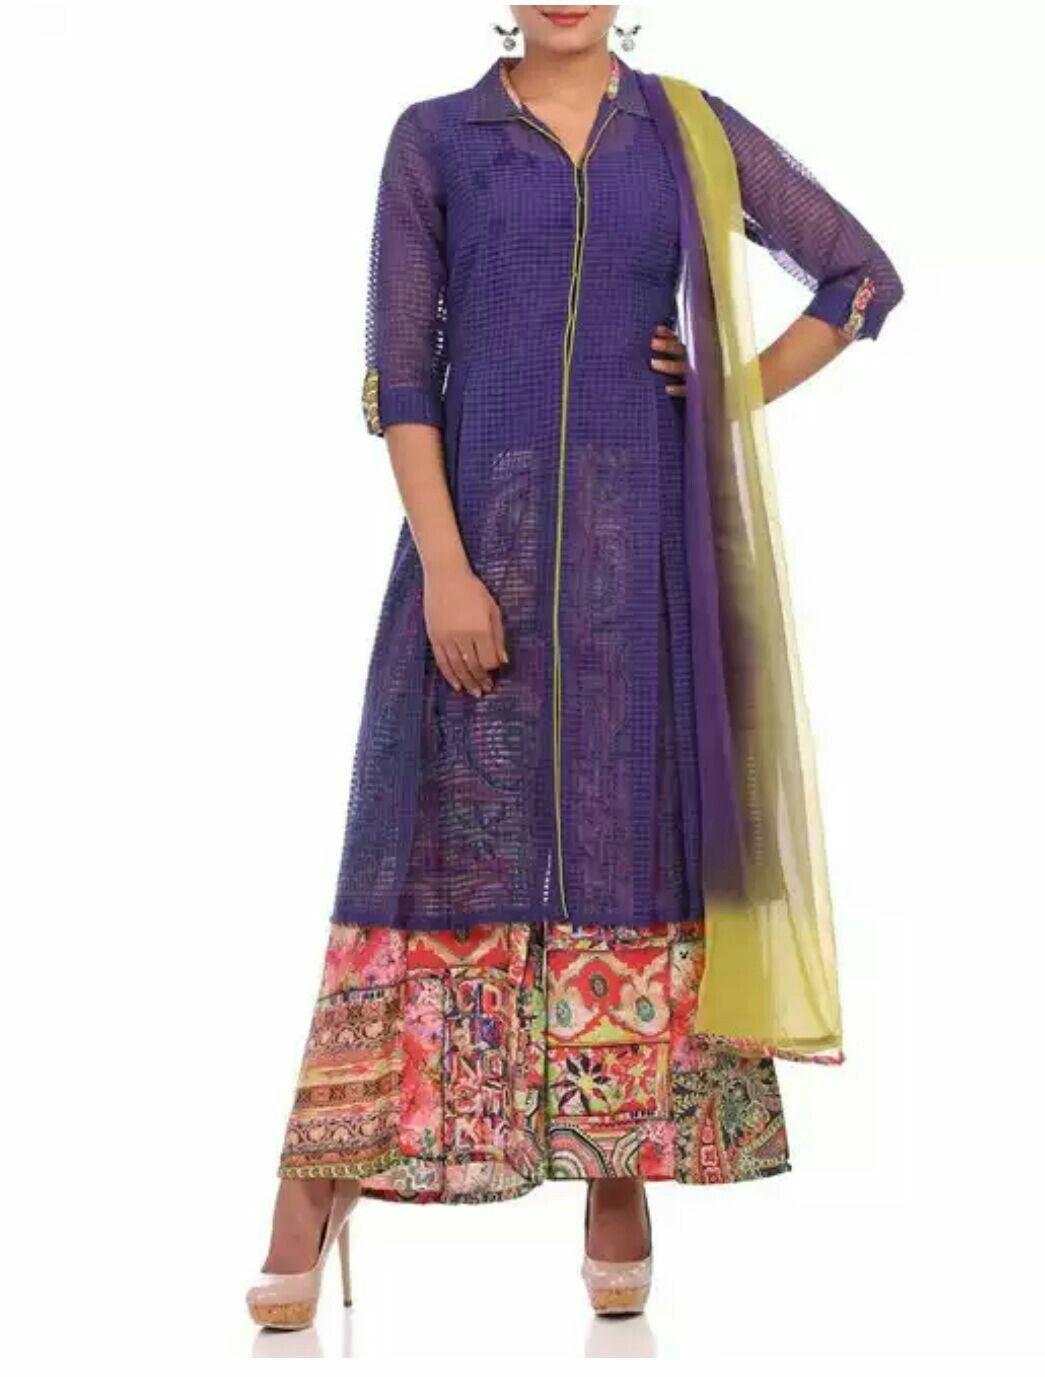 Biba dresses on 50% sale